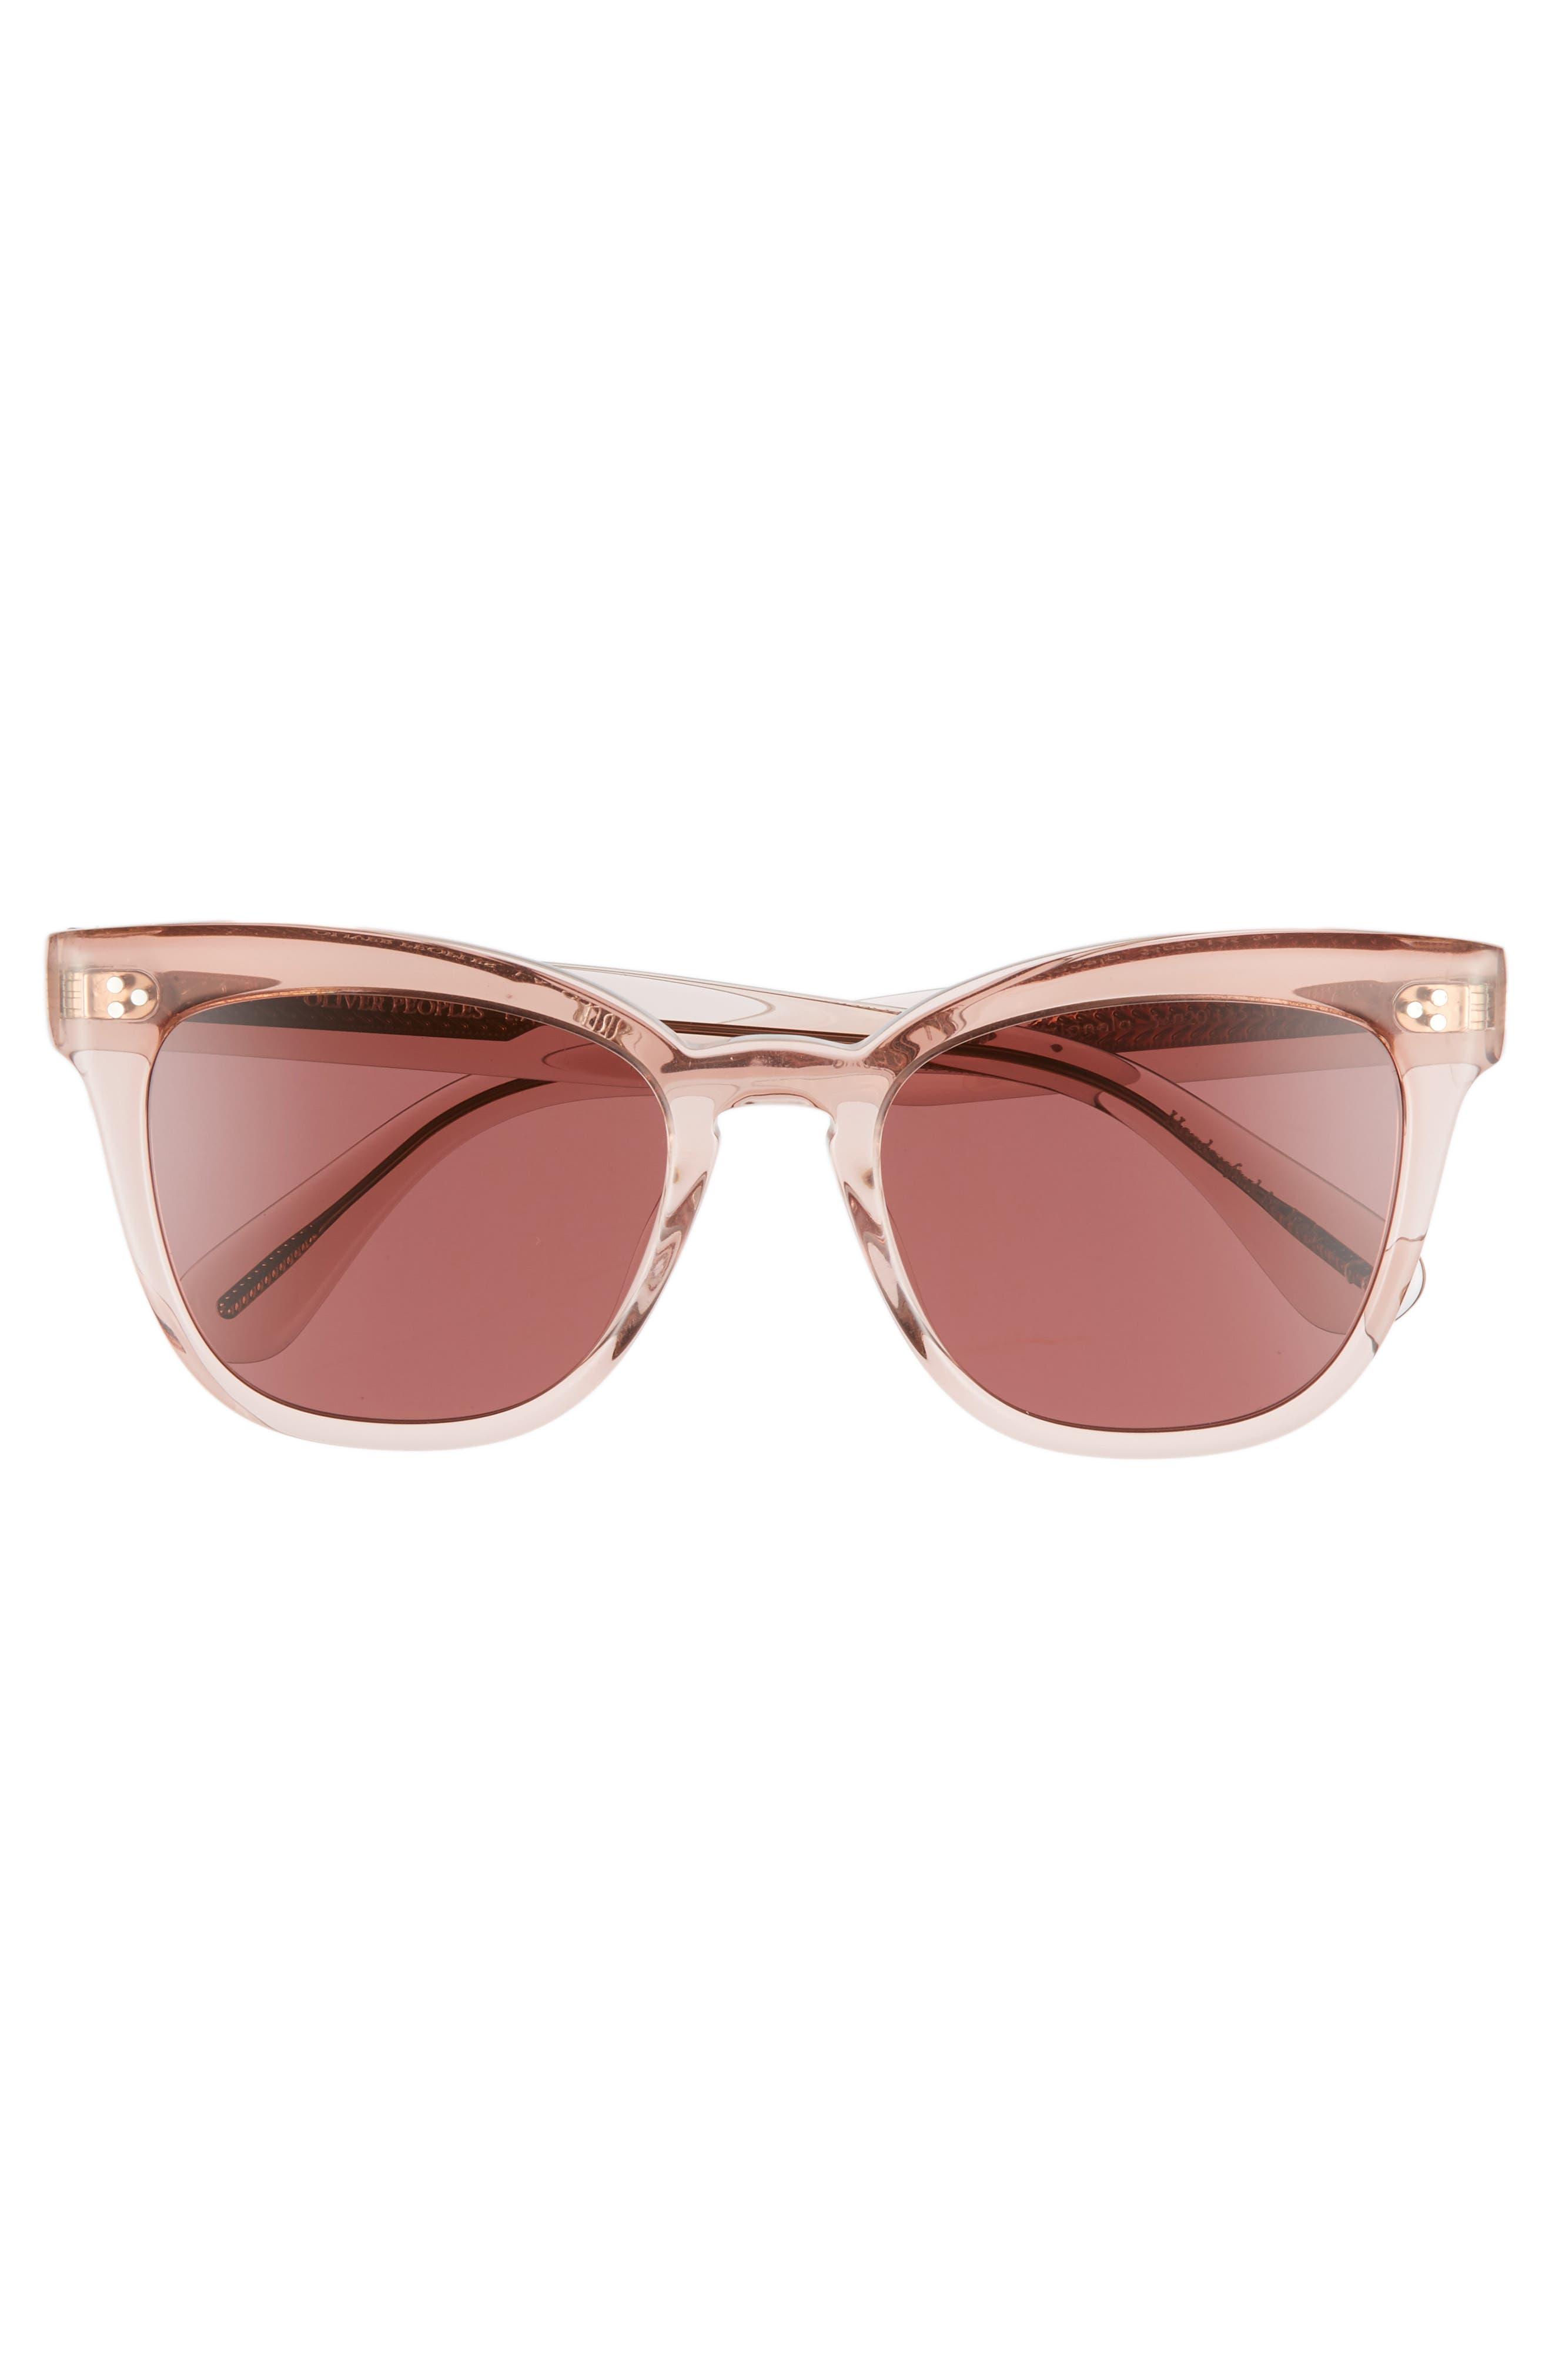 OLIVER PEOPLES,                             Marianela 54mm Cat Eye Sunglasses,                             Alternate thumbnail 3, color,                             WASHED ROSE